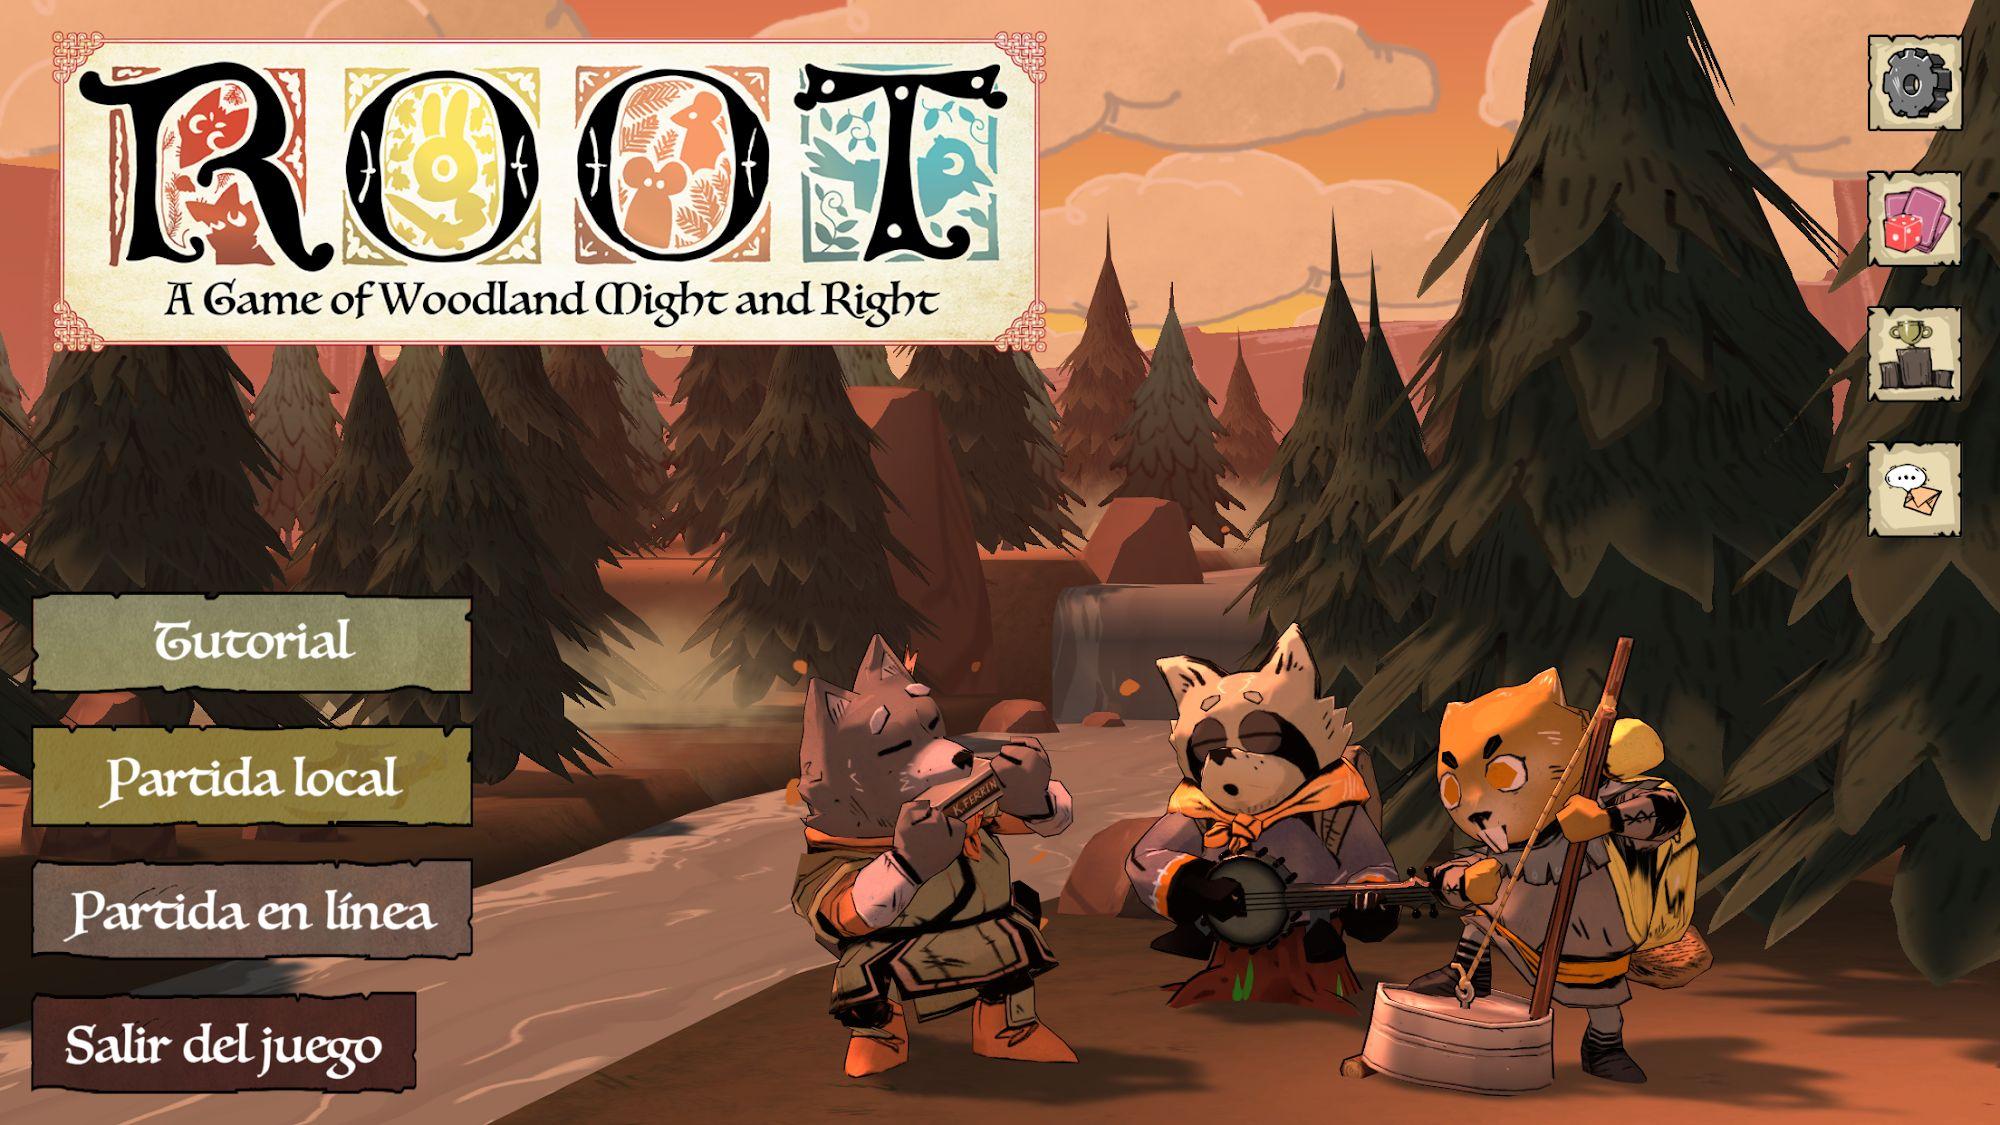 Root Board Game captura de pantalla 1